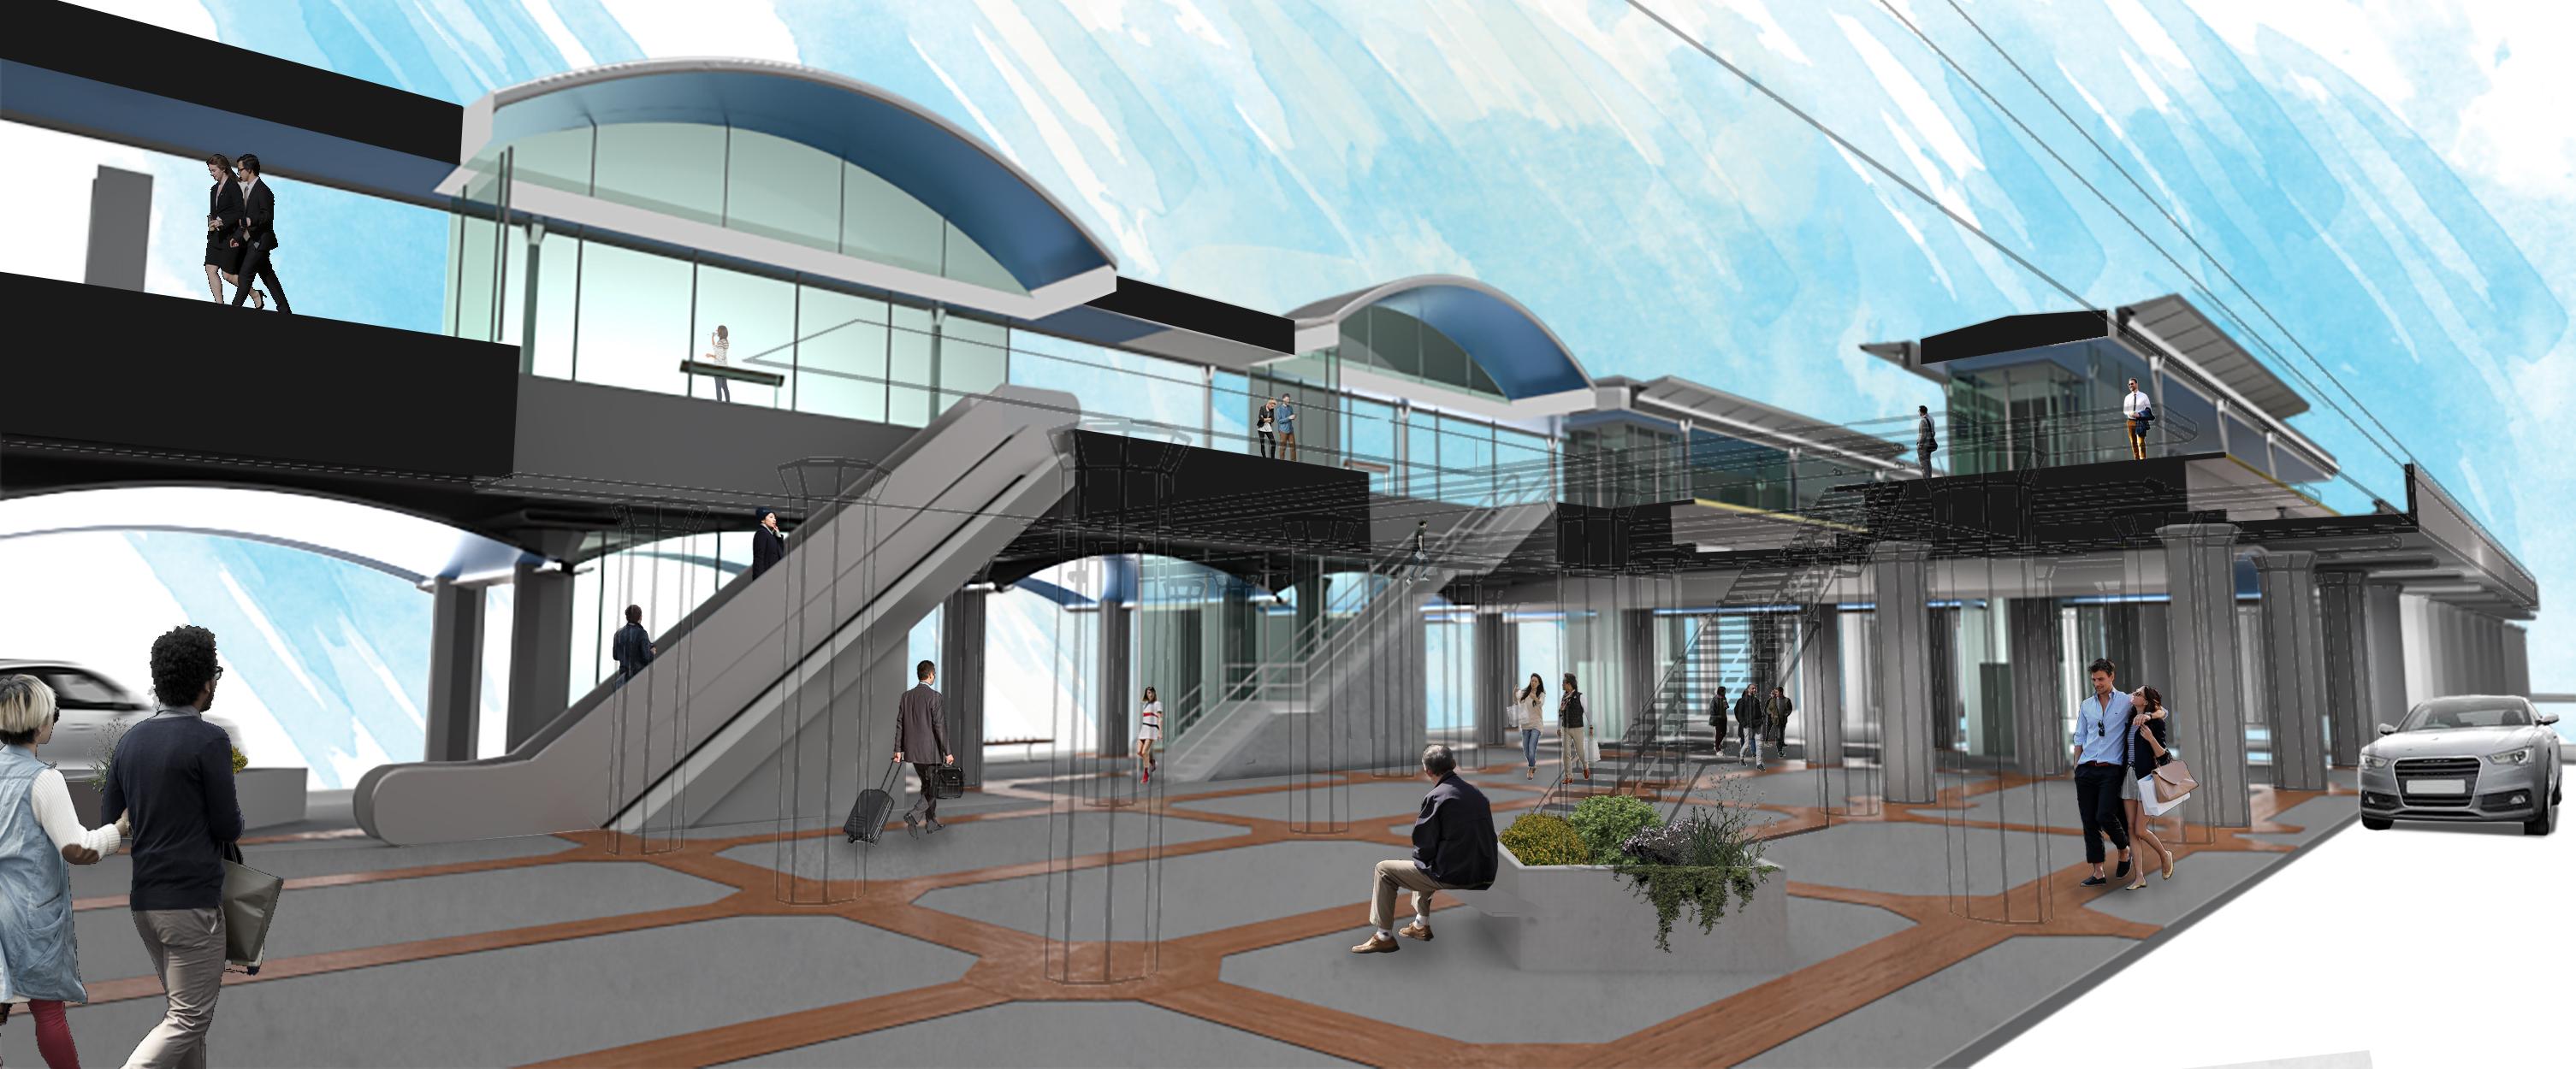 LIRR Babylon Station